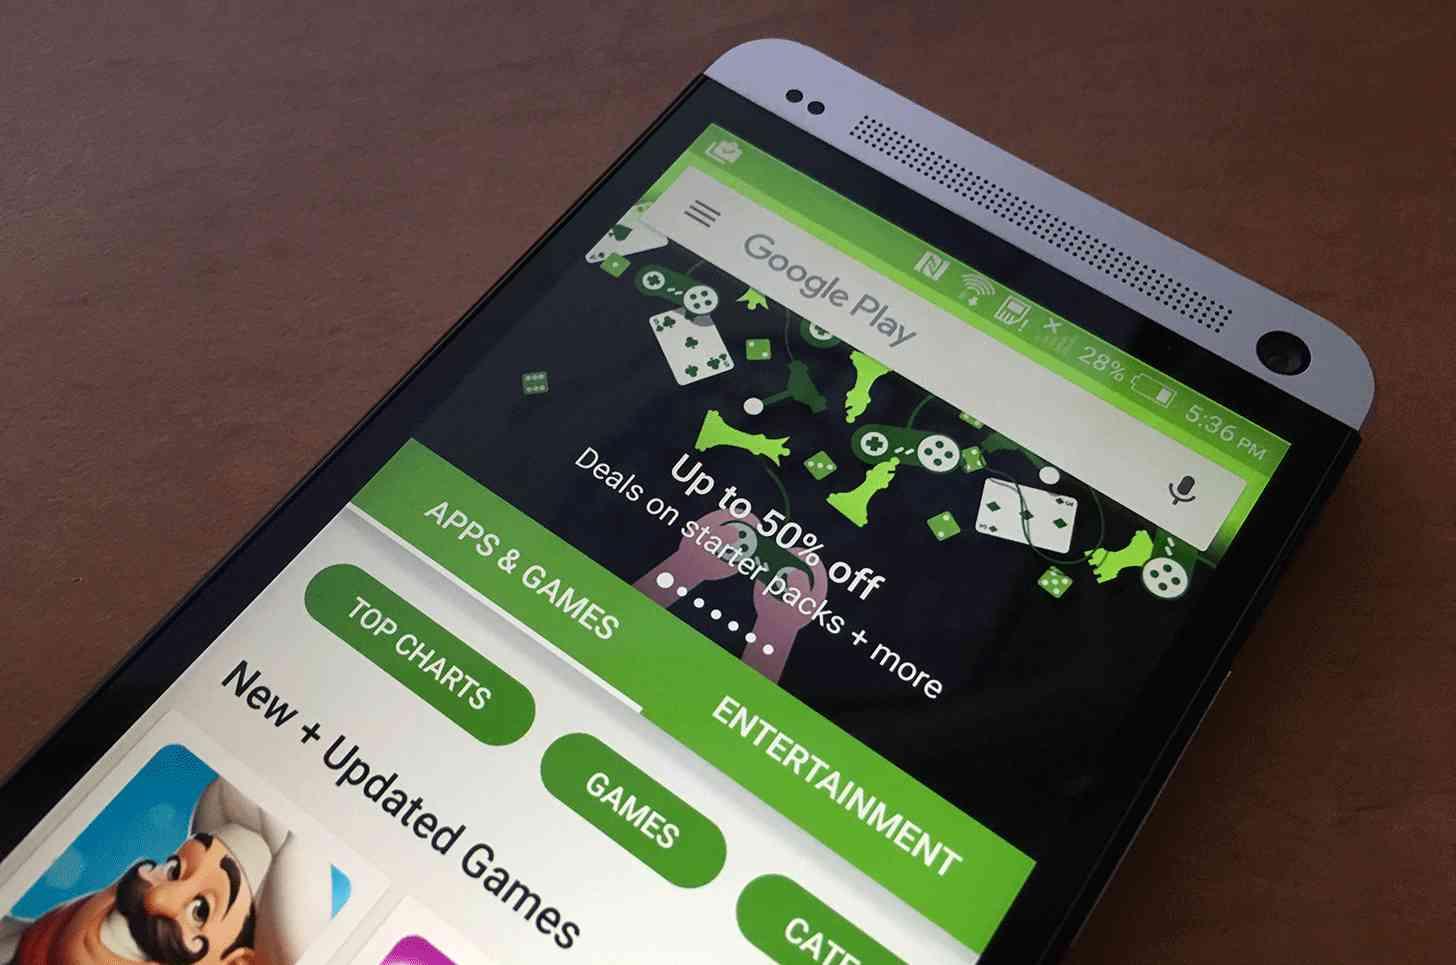 Google Play Store app HTC One M7